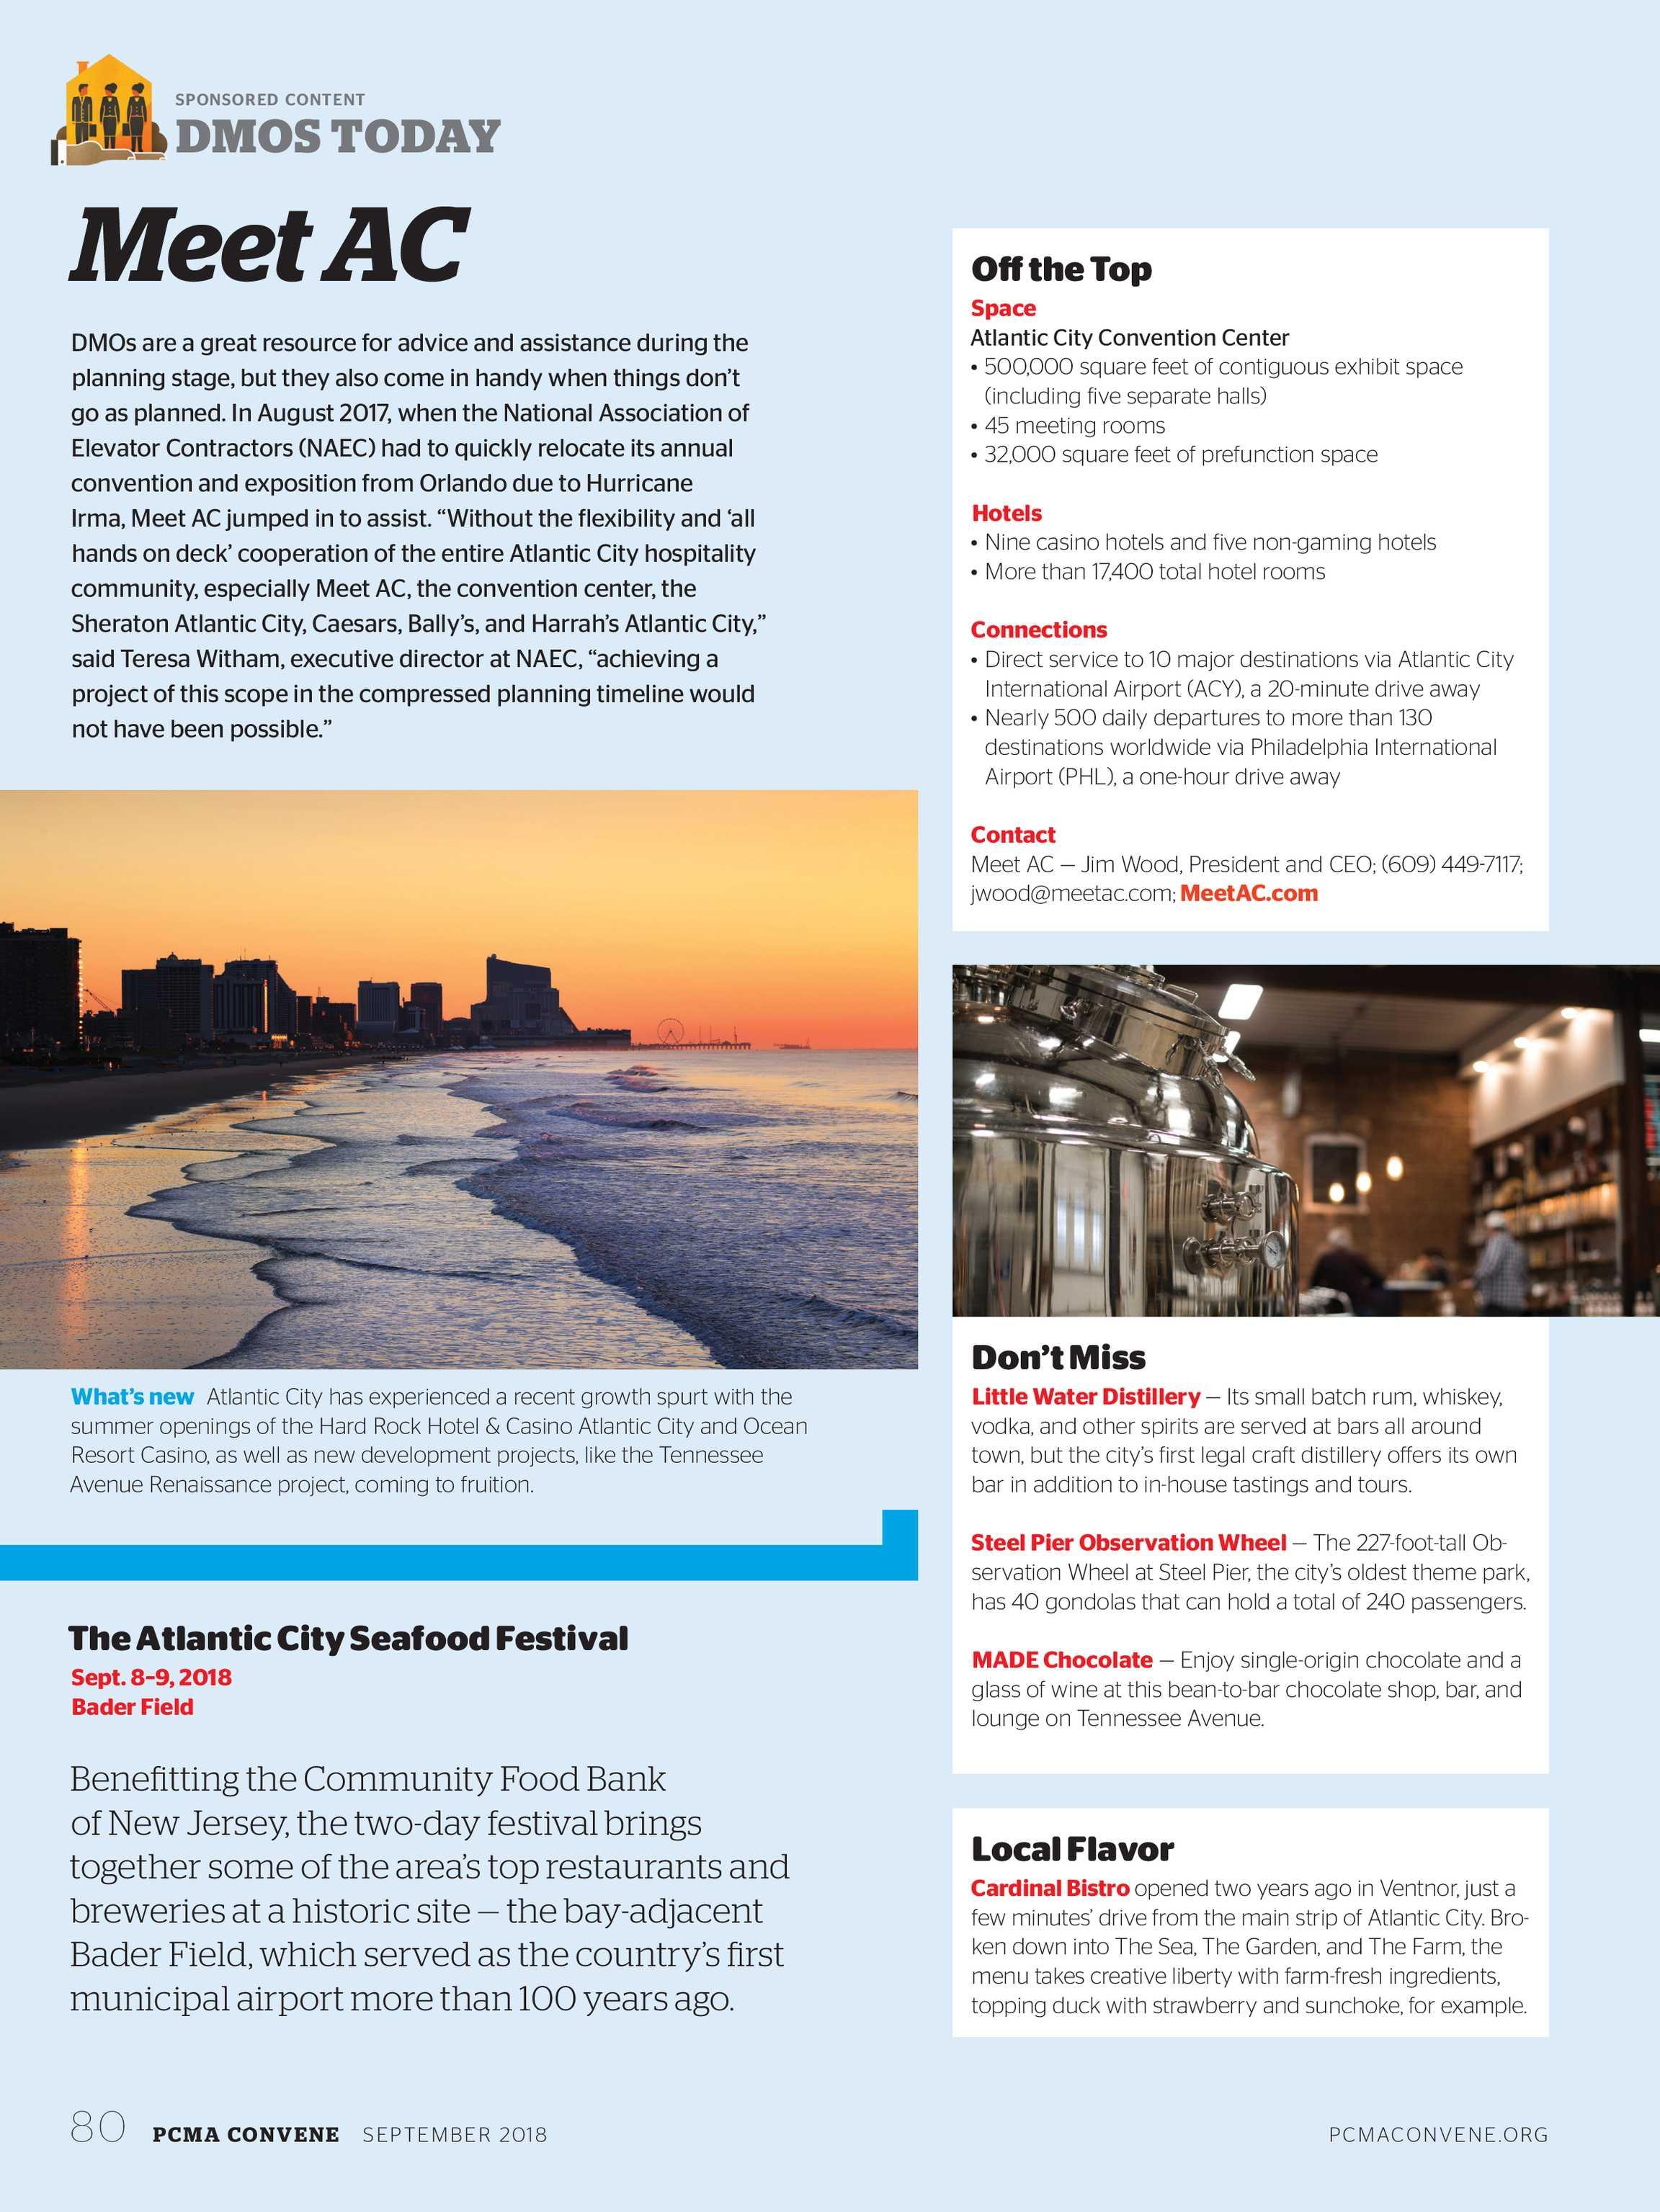 Convene - September 2018 - page 80